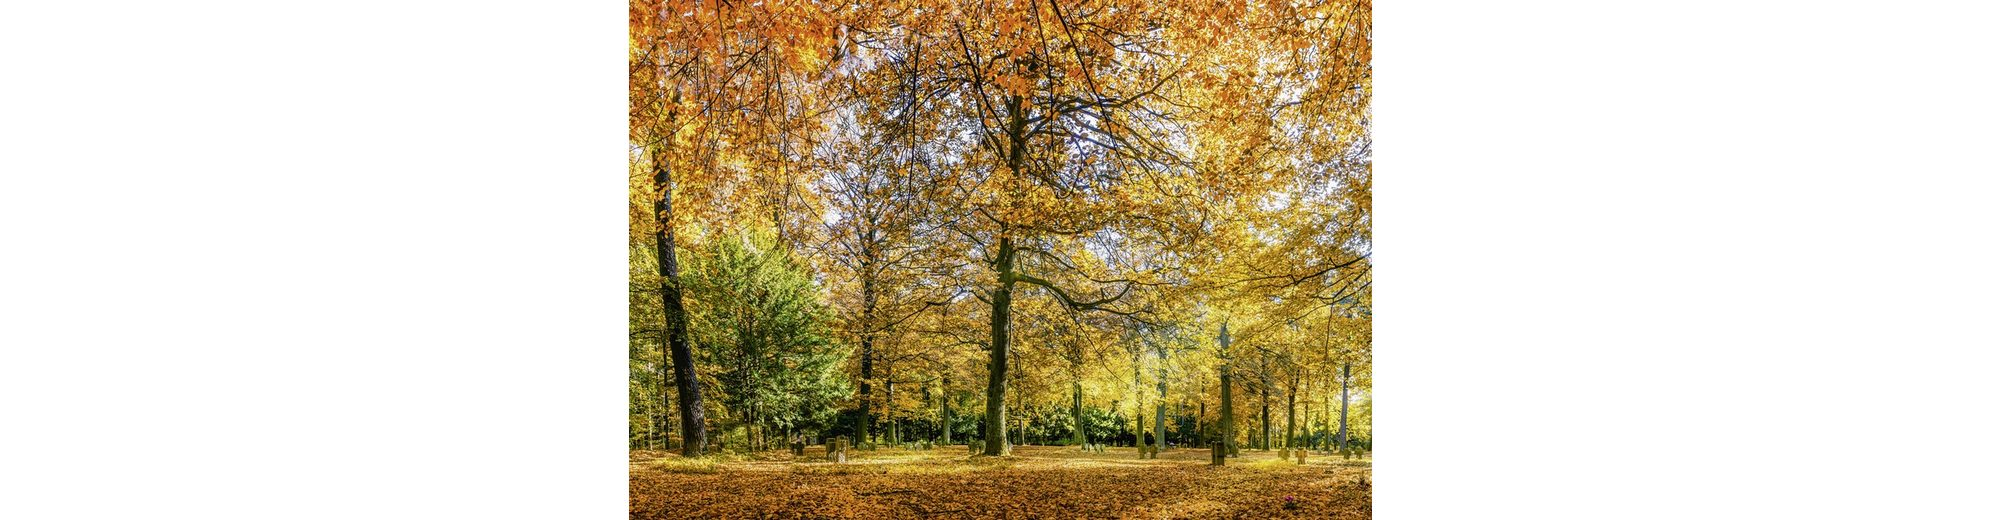 Home affaire Leinwandbild »eyetronic: Herbstwald Panorama«, 100/70 cm